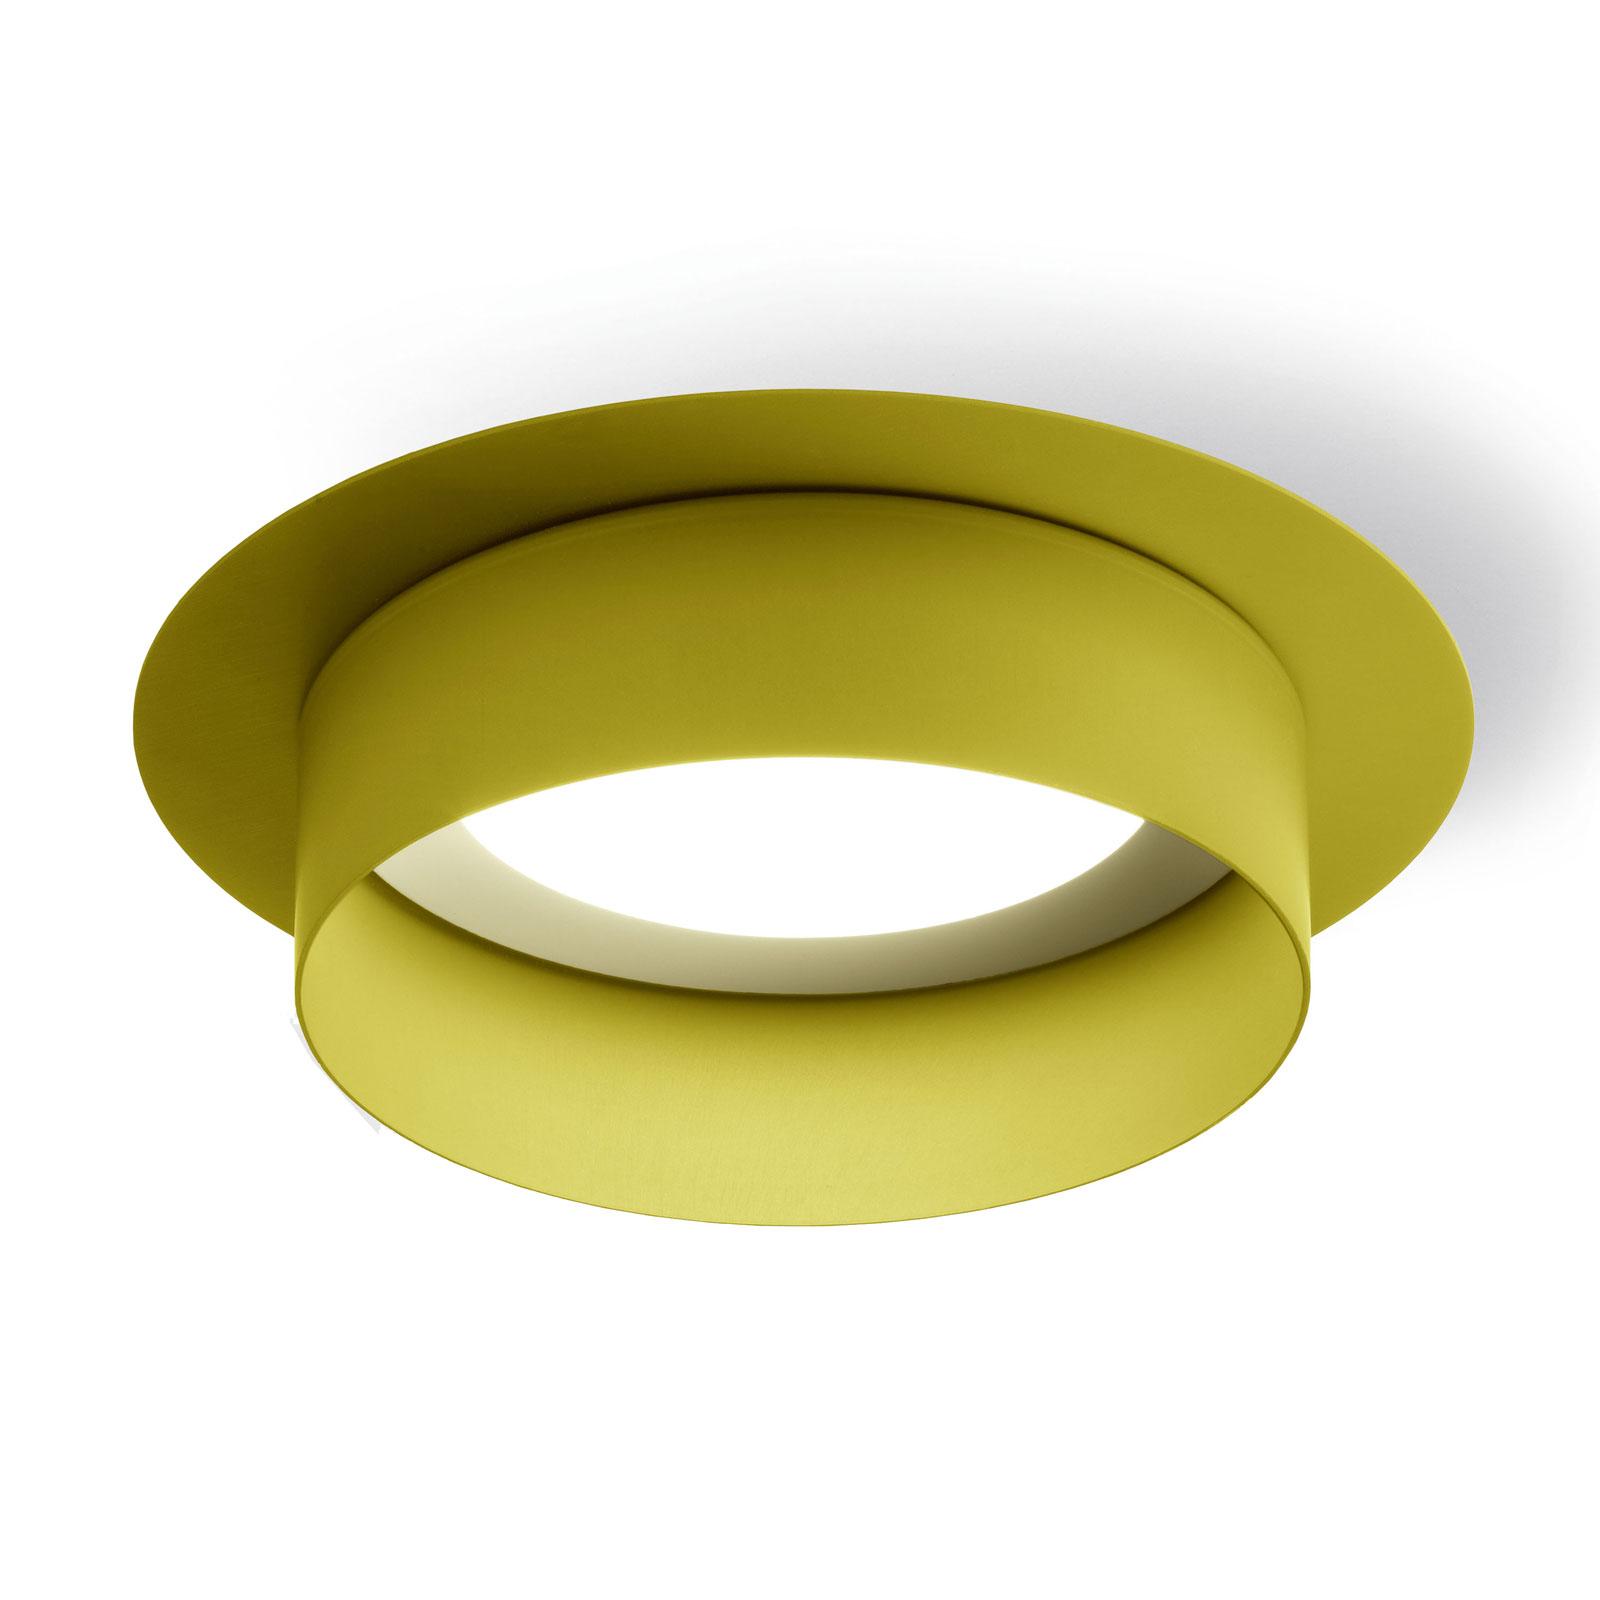 Modo Luce Hammer loftlampe direkte Ø 18 cm, limone